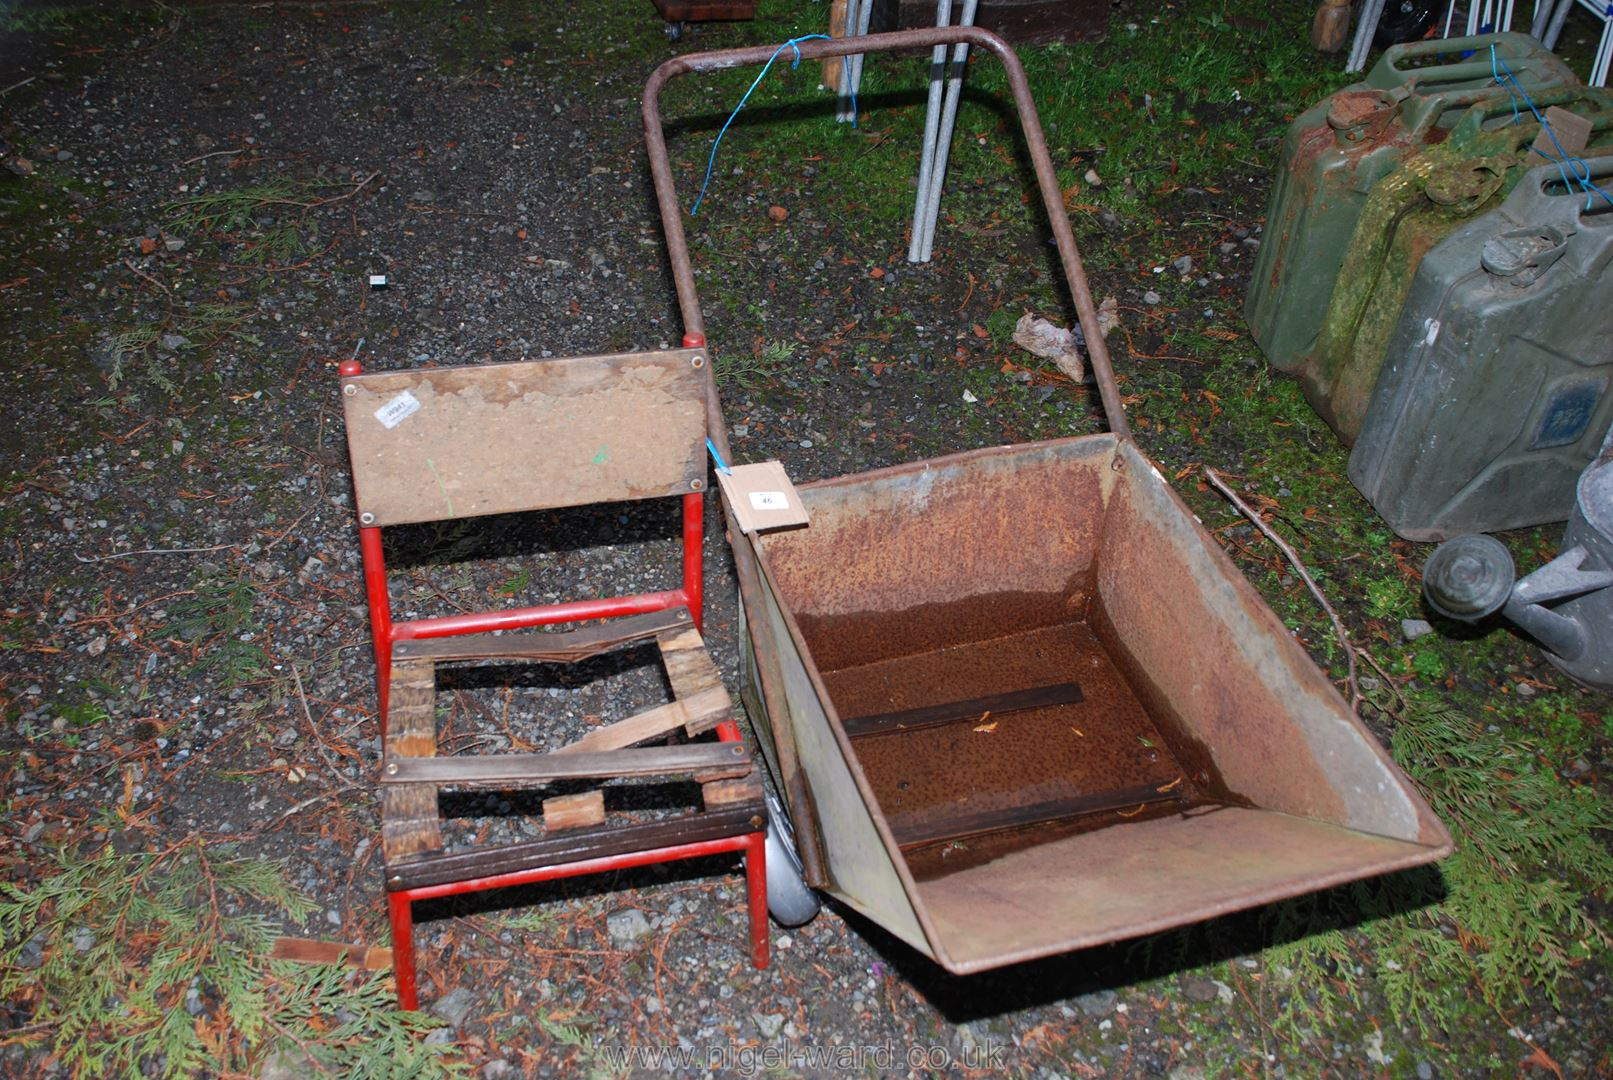 Metal garden wheelbarrow and metal child's chair, both a/f.